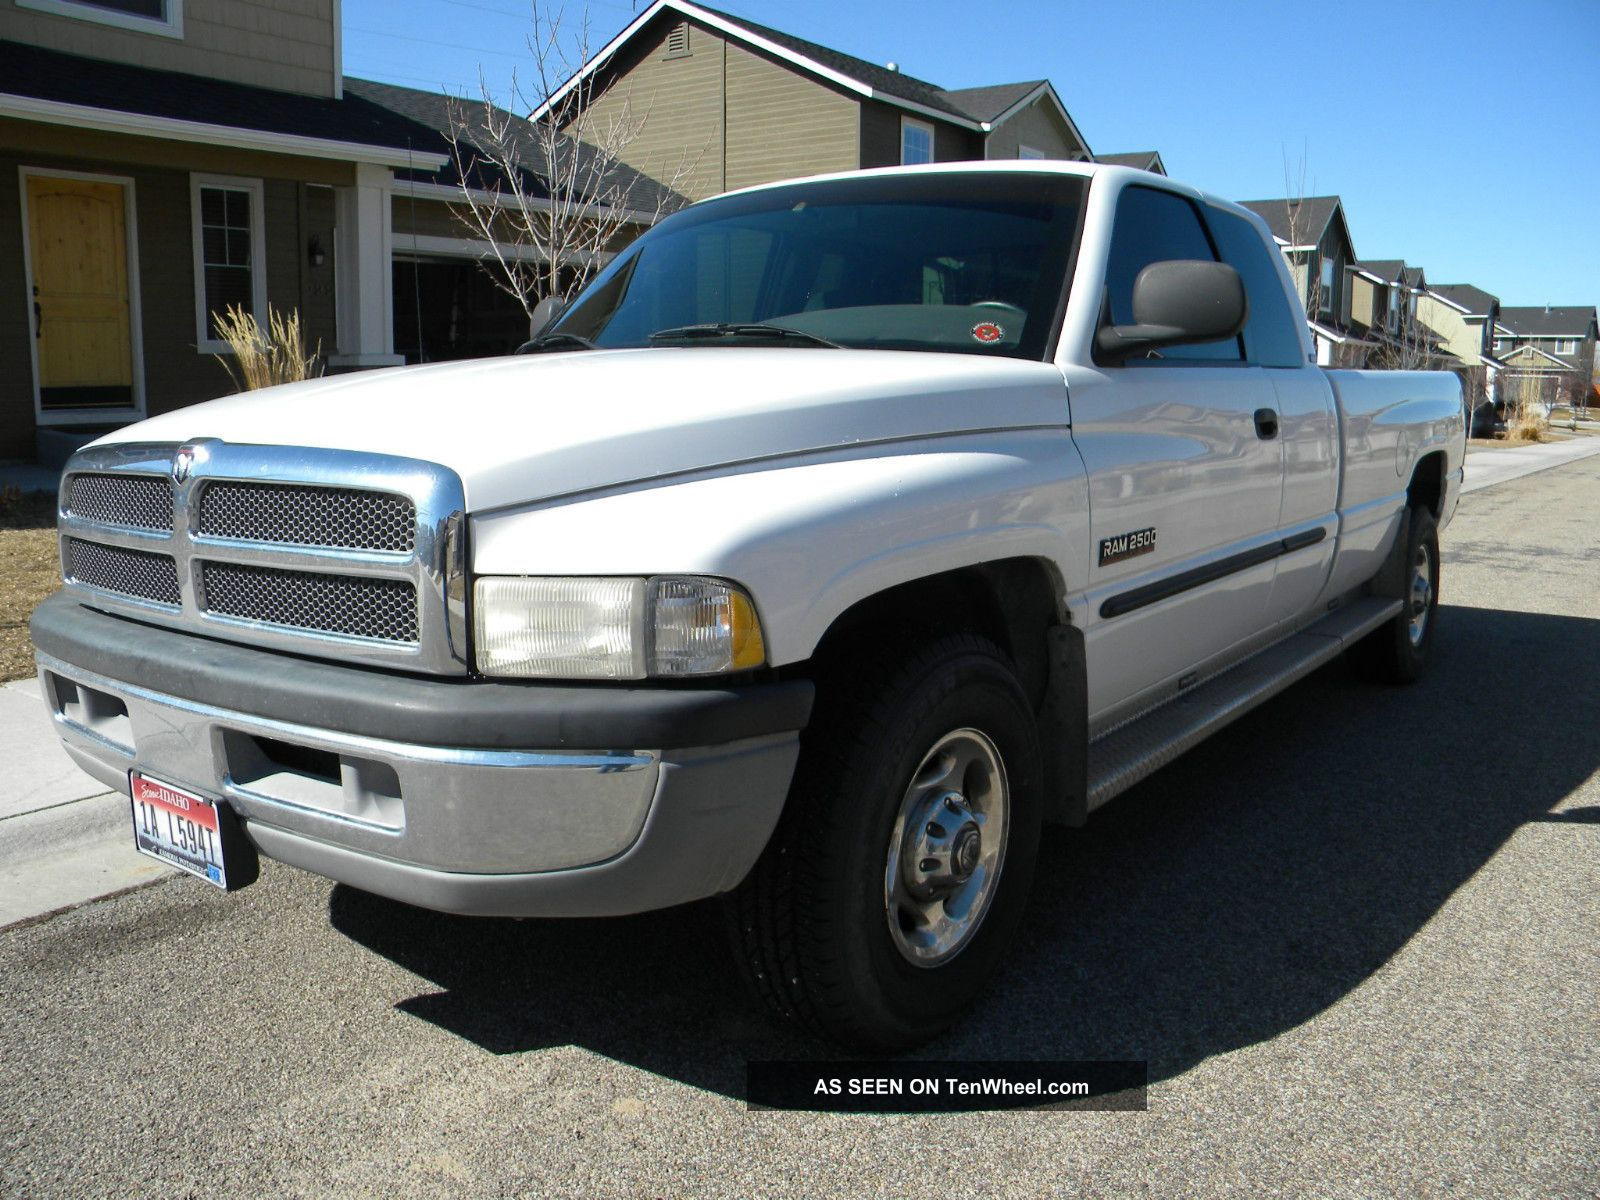 2001 dodge ram 2500 cummins turbo diesel ram 2500 photo 2. Cars Review. Best American Auto & Cars Review